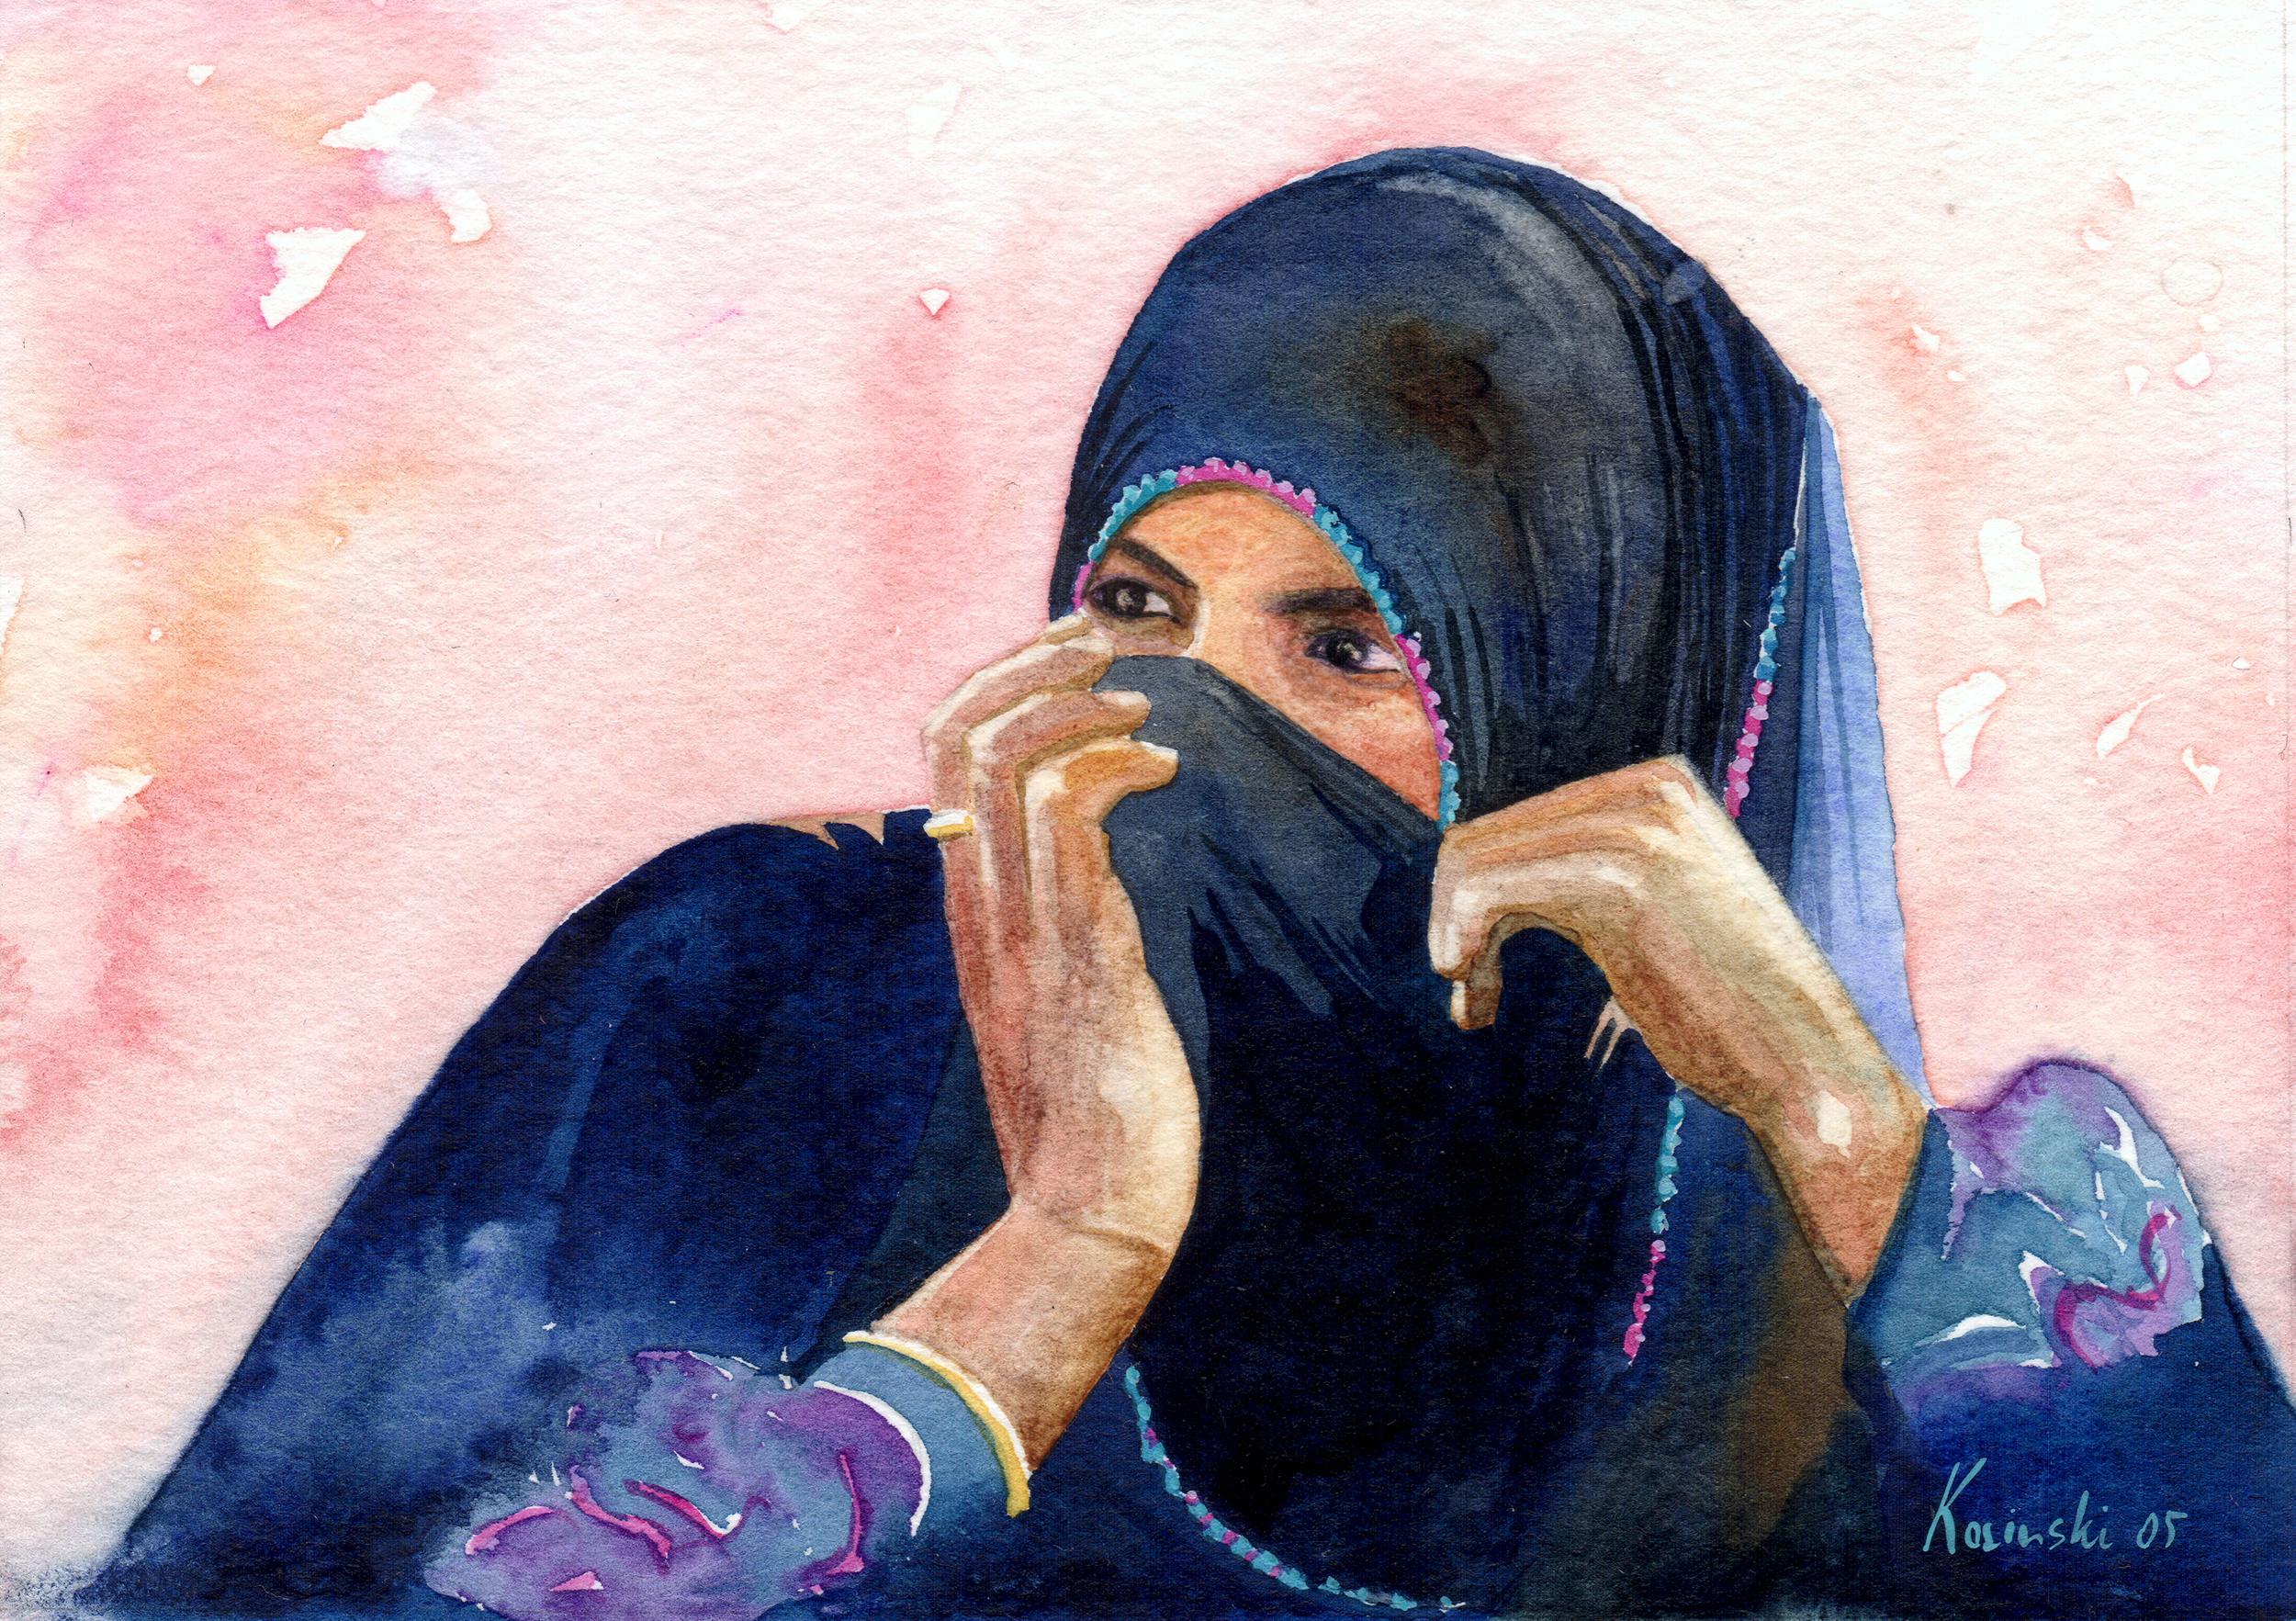 Bedouin Girl, Sinai